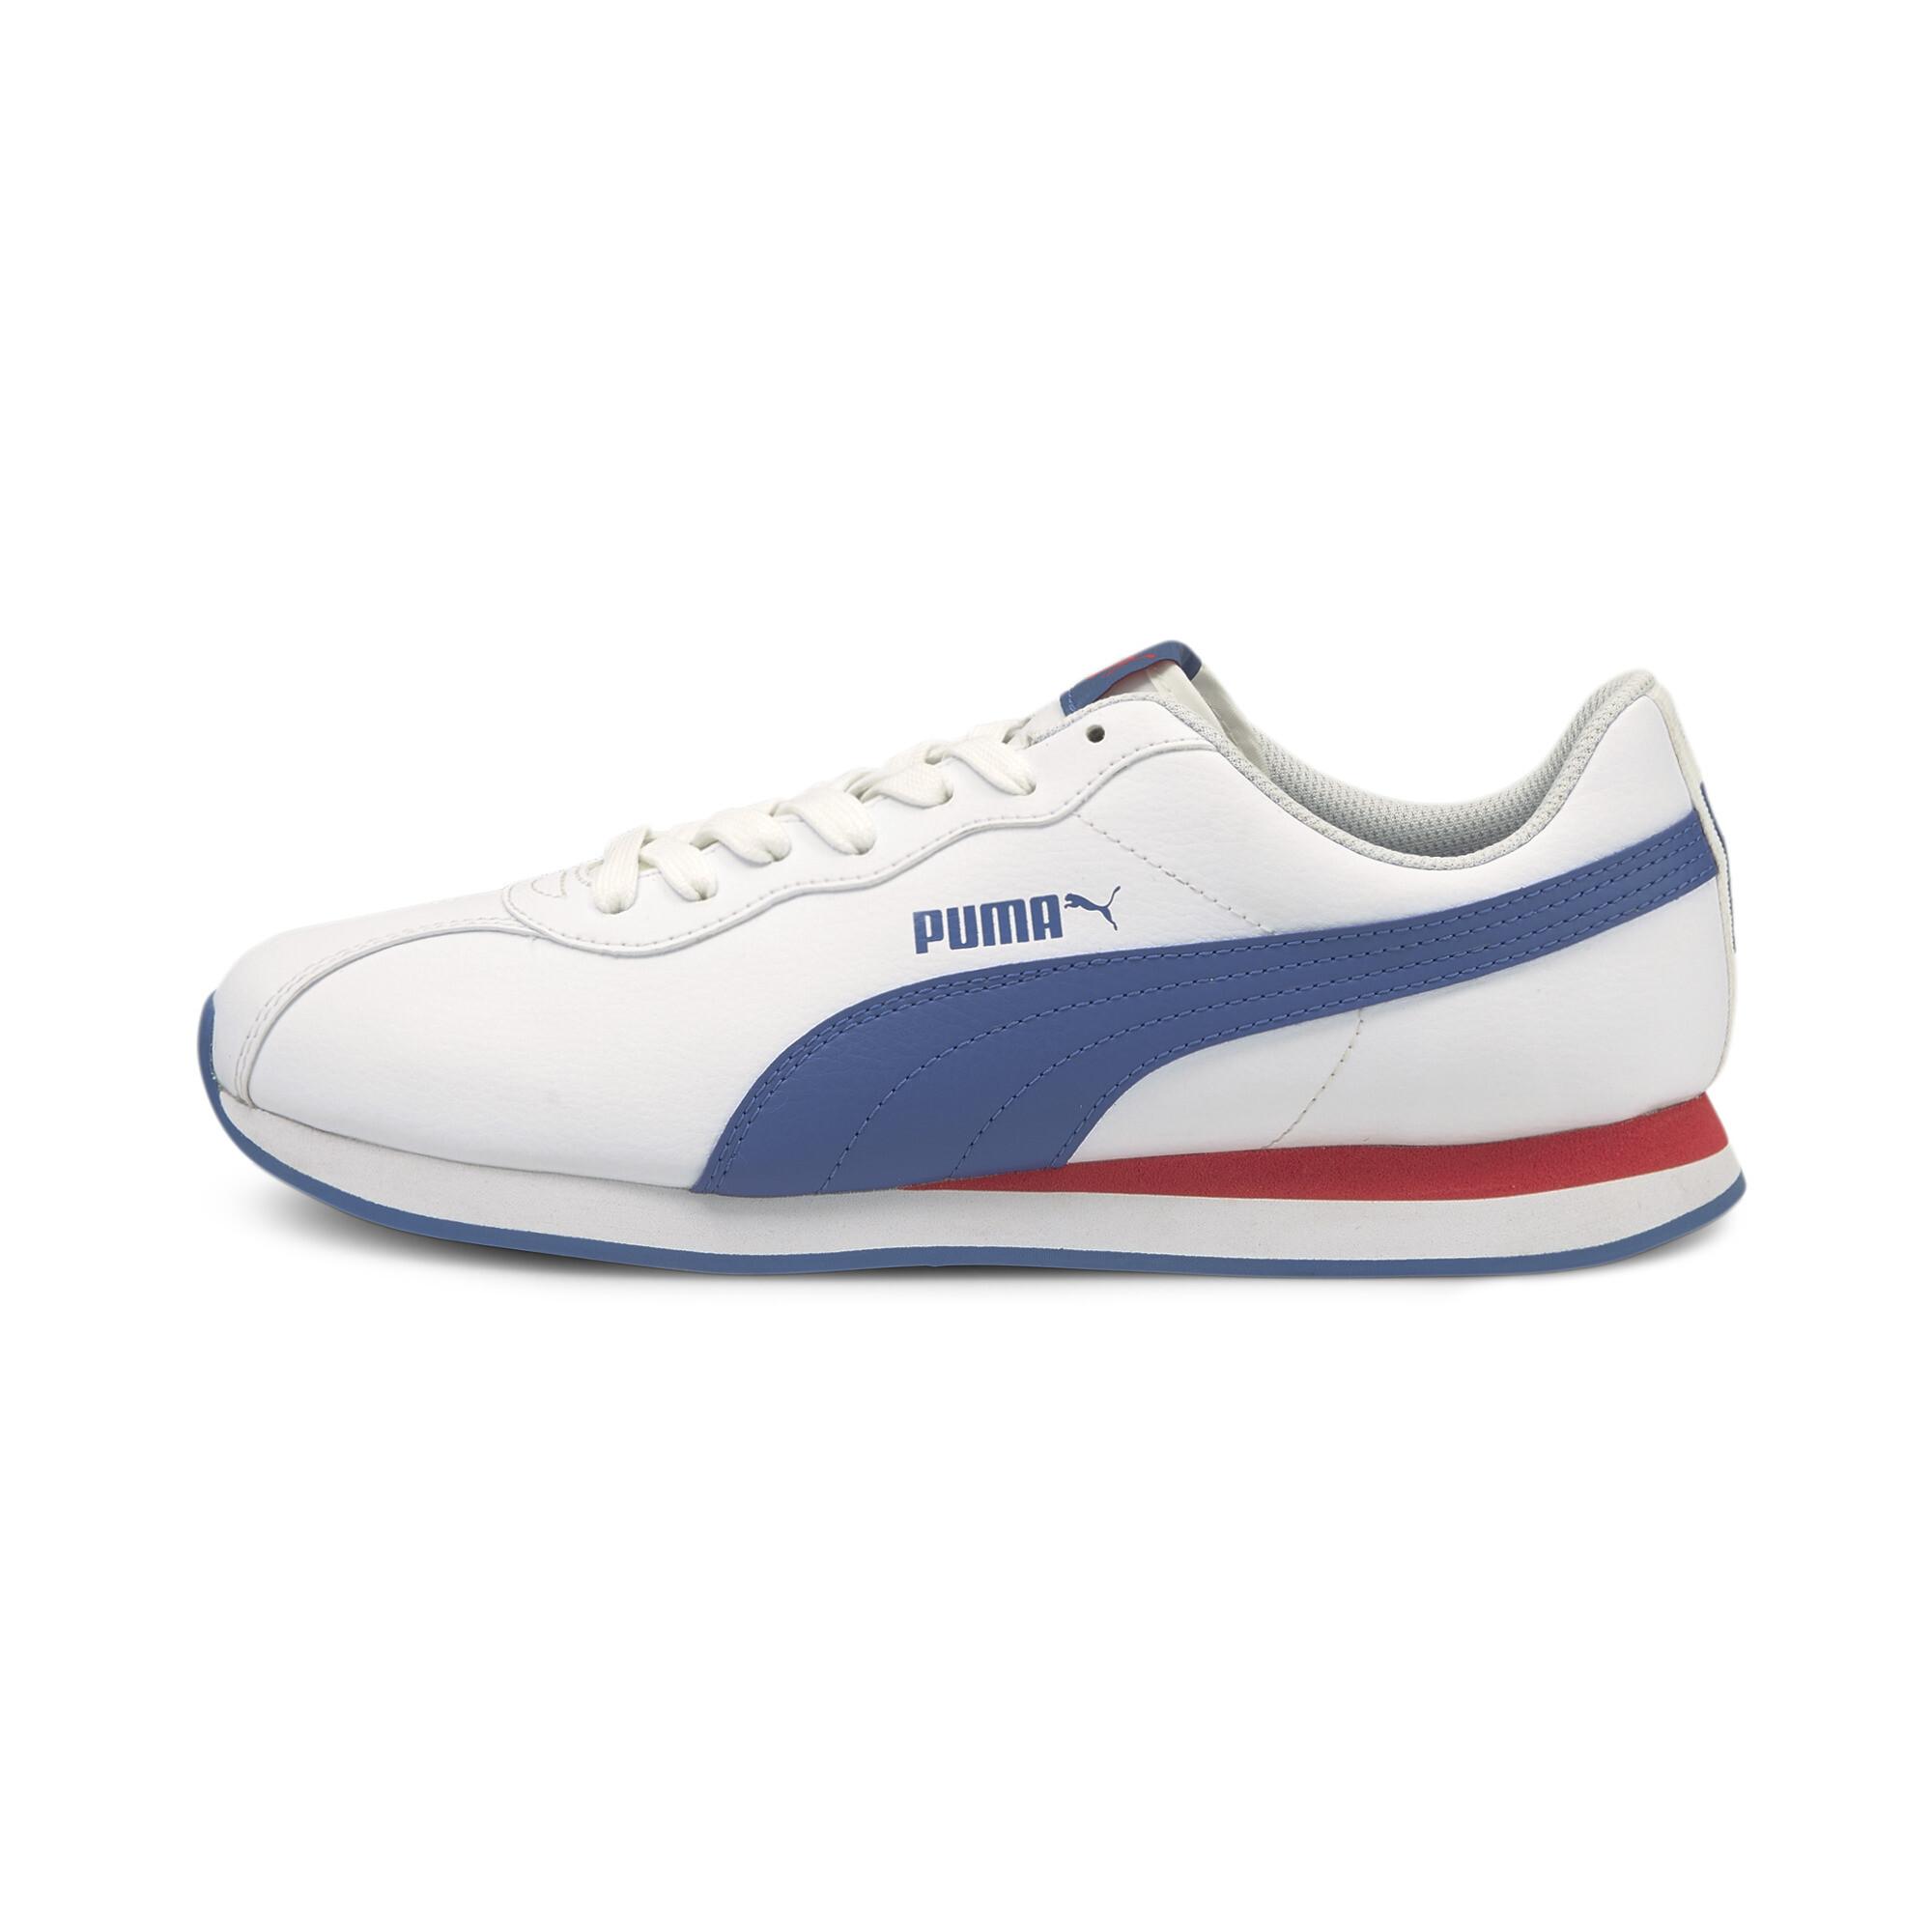 thumbnail 21 - PUMA Men's Turin II Sneakers